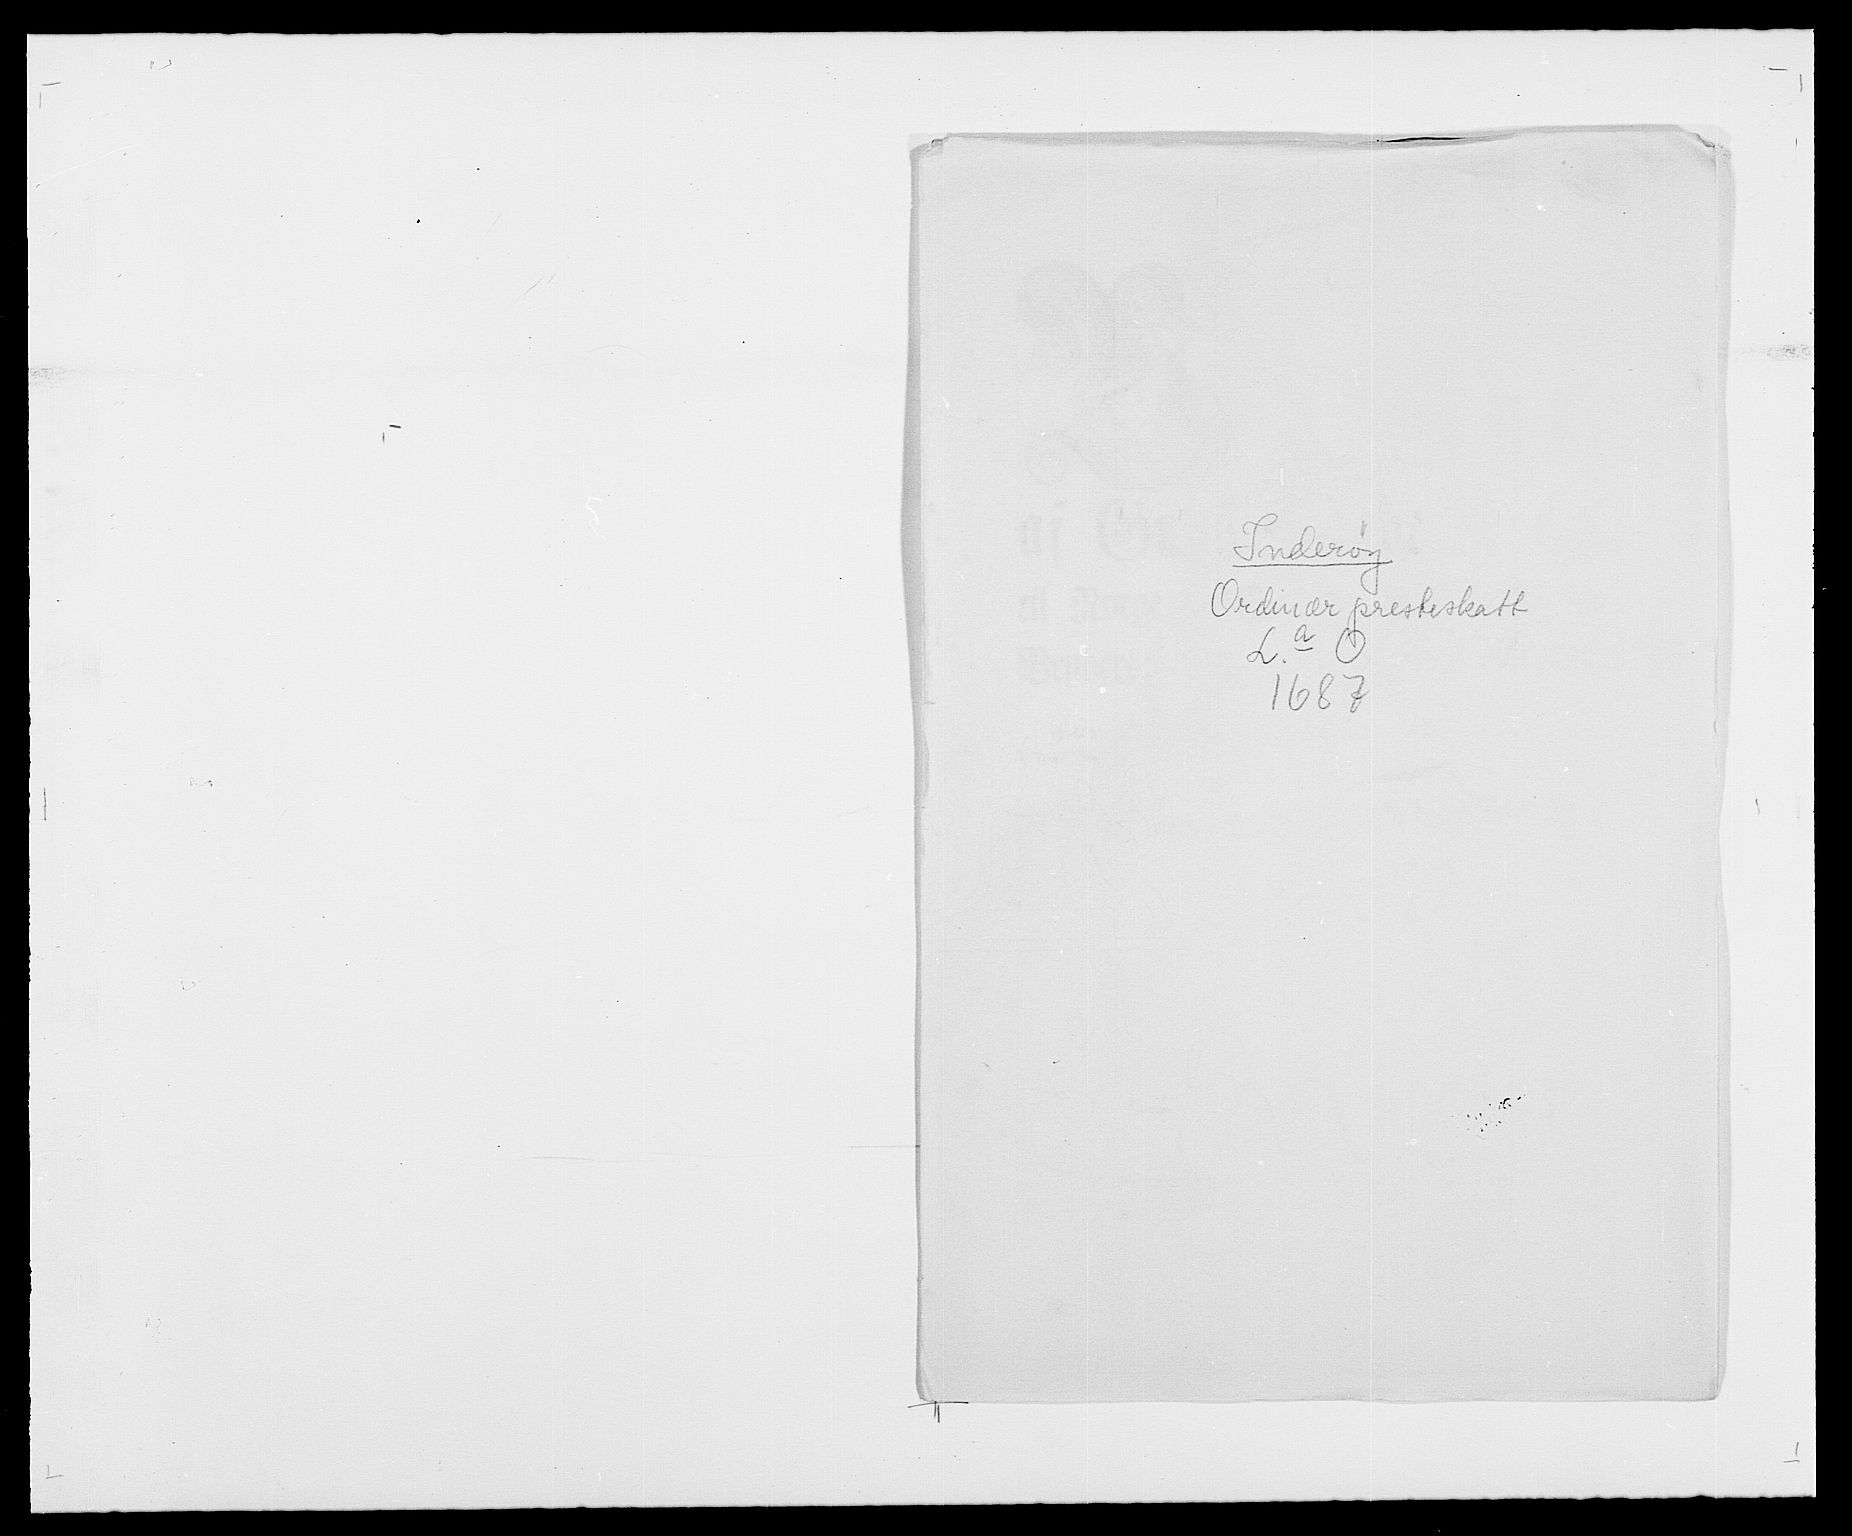 RA, Rentekammeret inntil 1814, Reviderte regnskaper, Fogderegnskap, R63/L4306: Fogderegnskap Inderøy, 1687-1689, s. 176